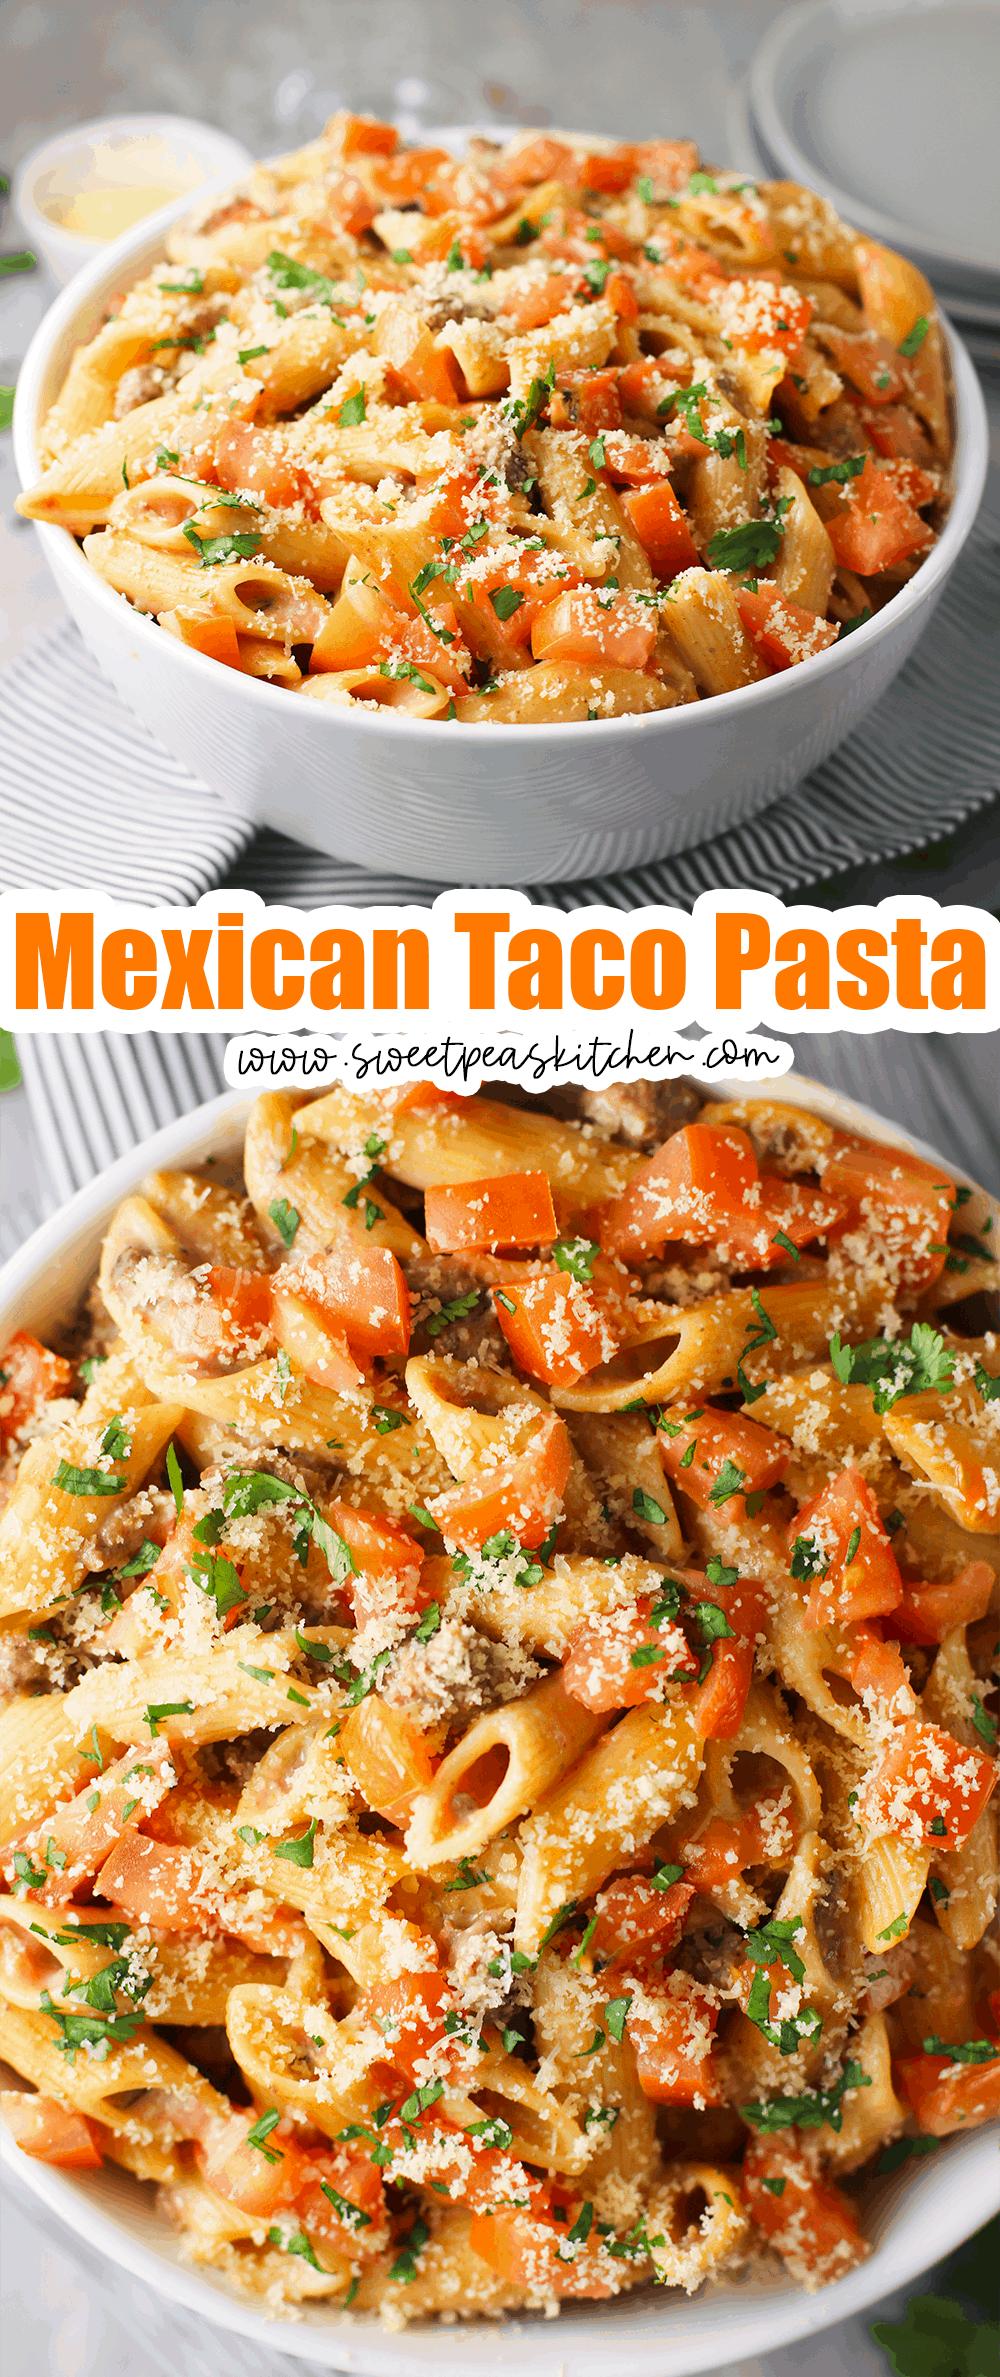 Mexican Taco Pasta